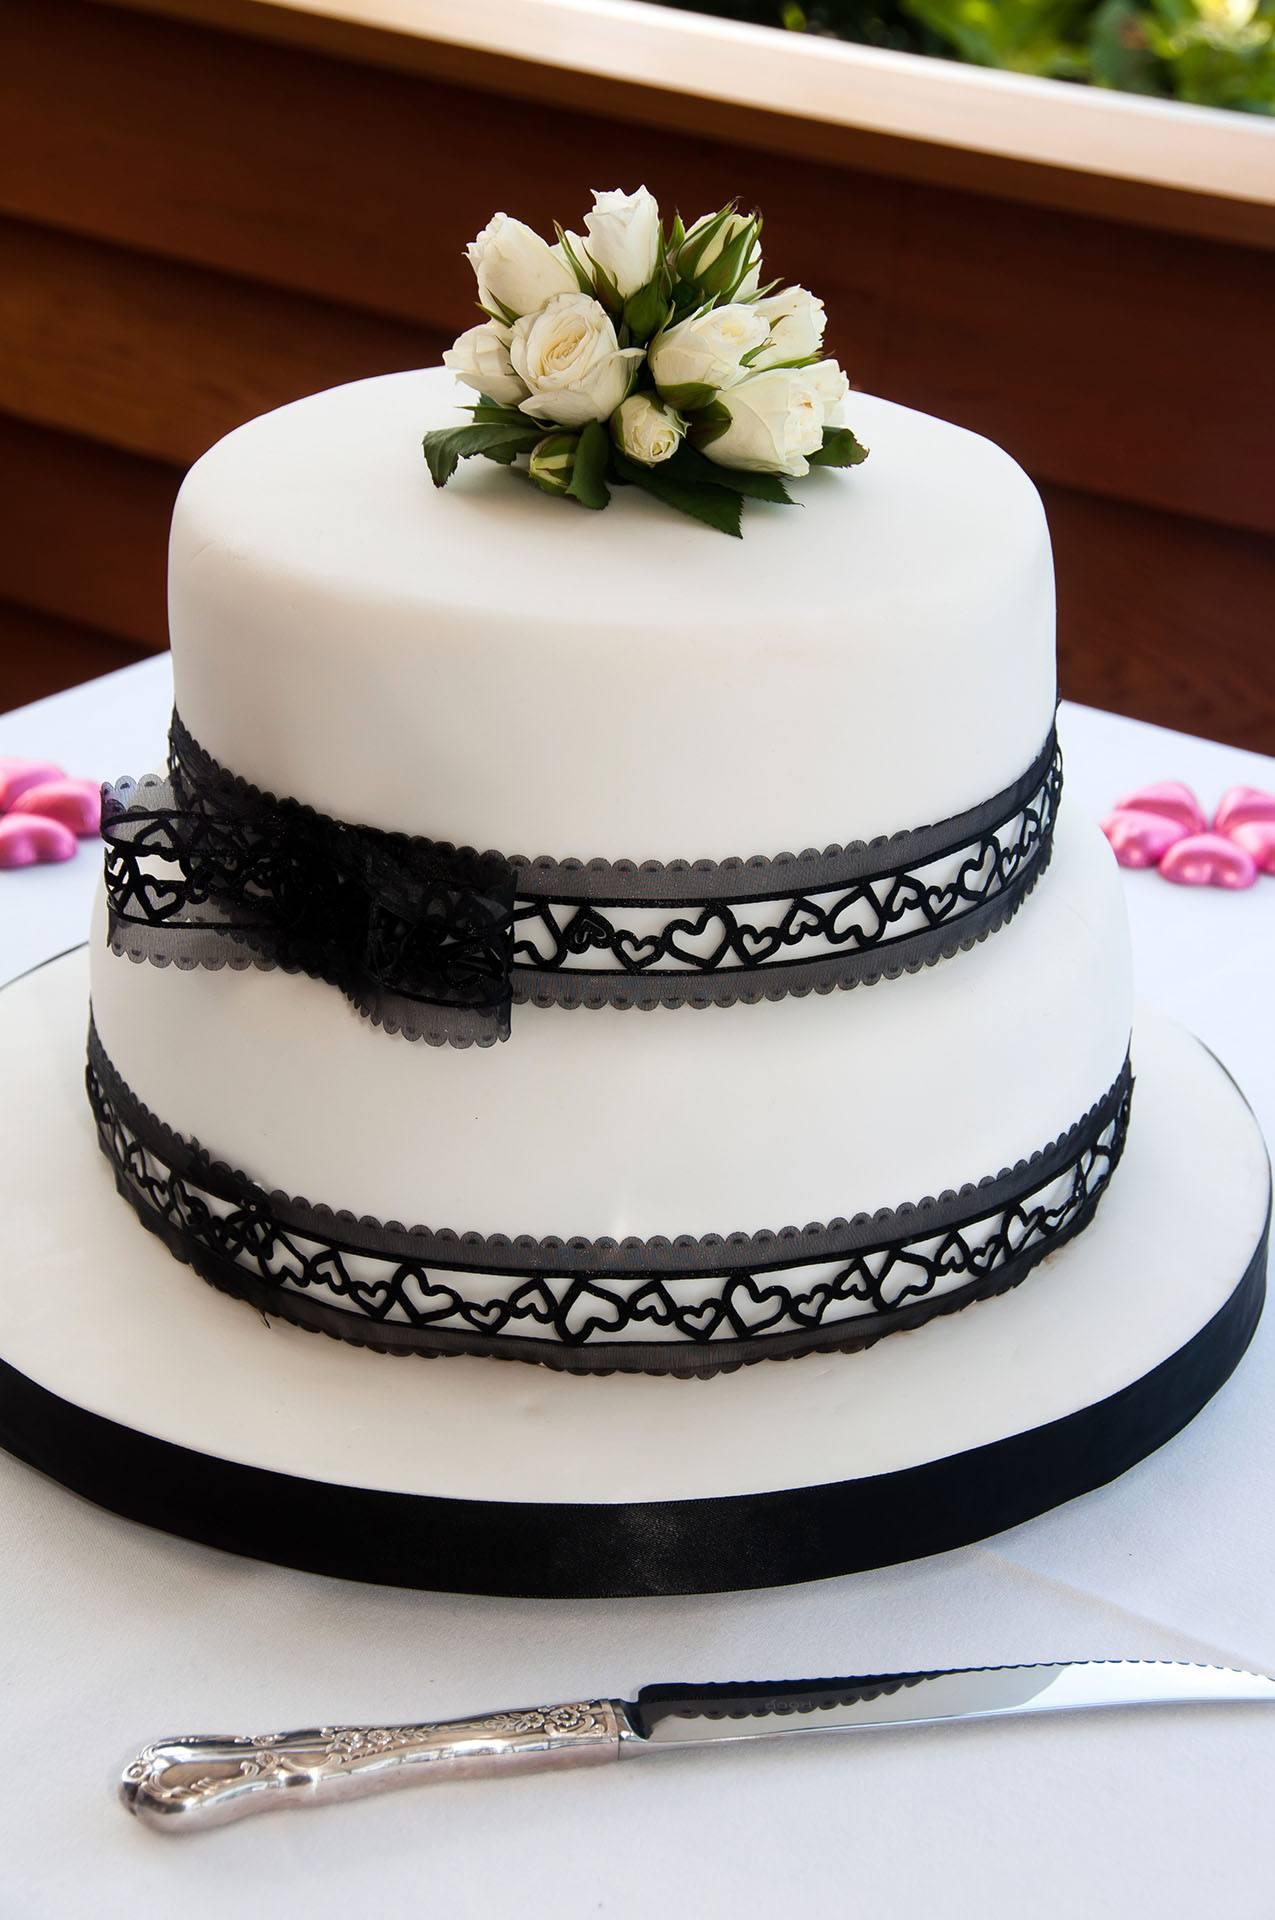 Bílo-černý patrový svatební dort s růžičkami